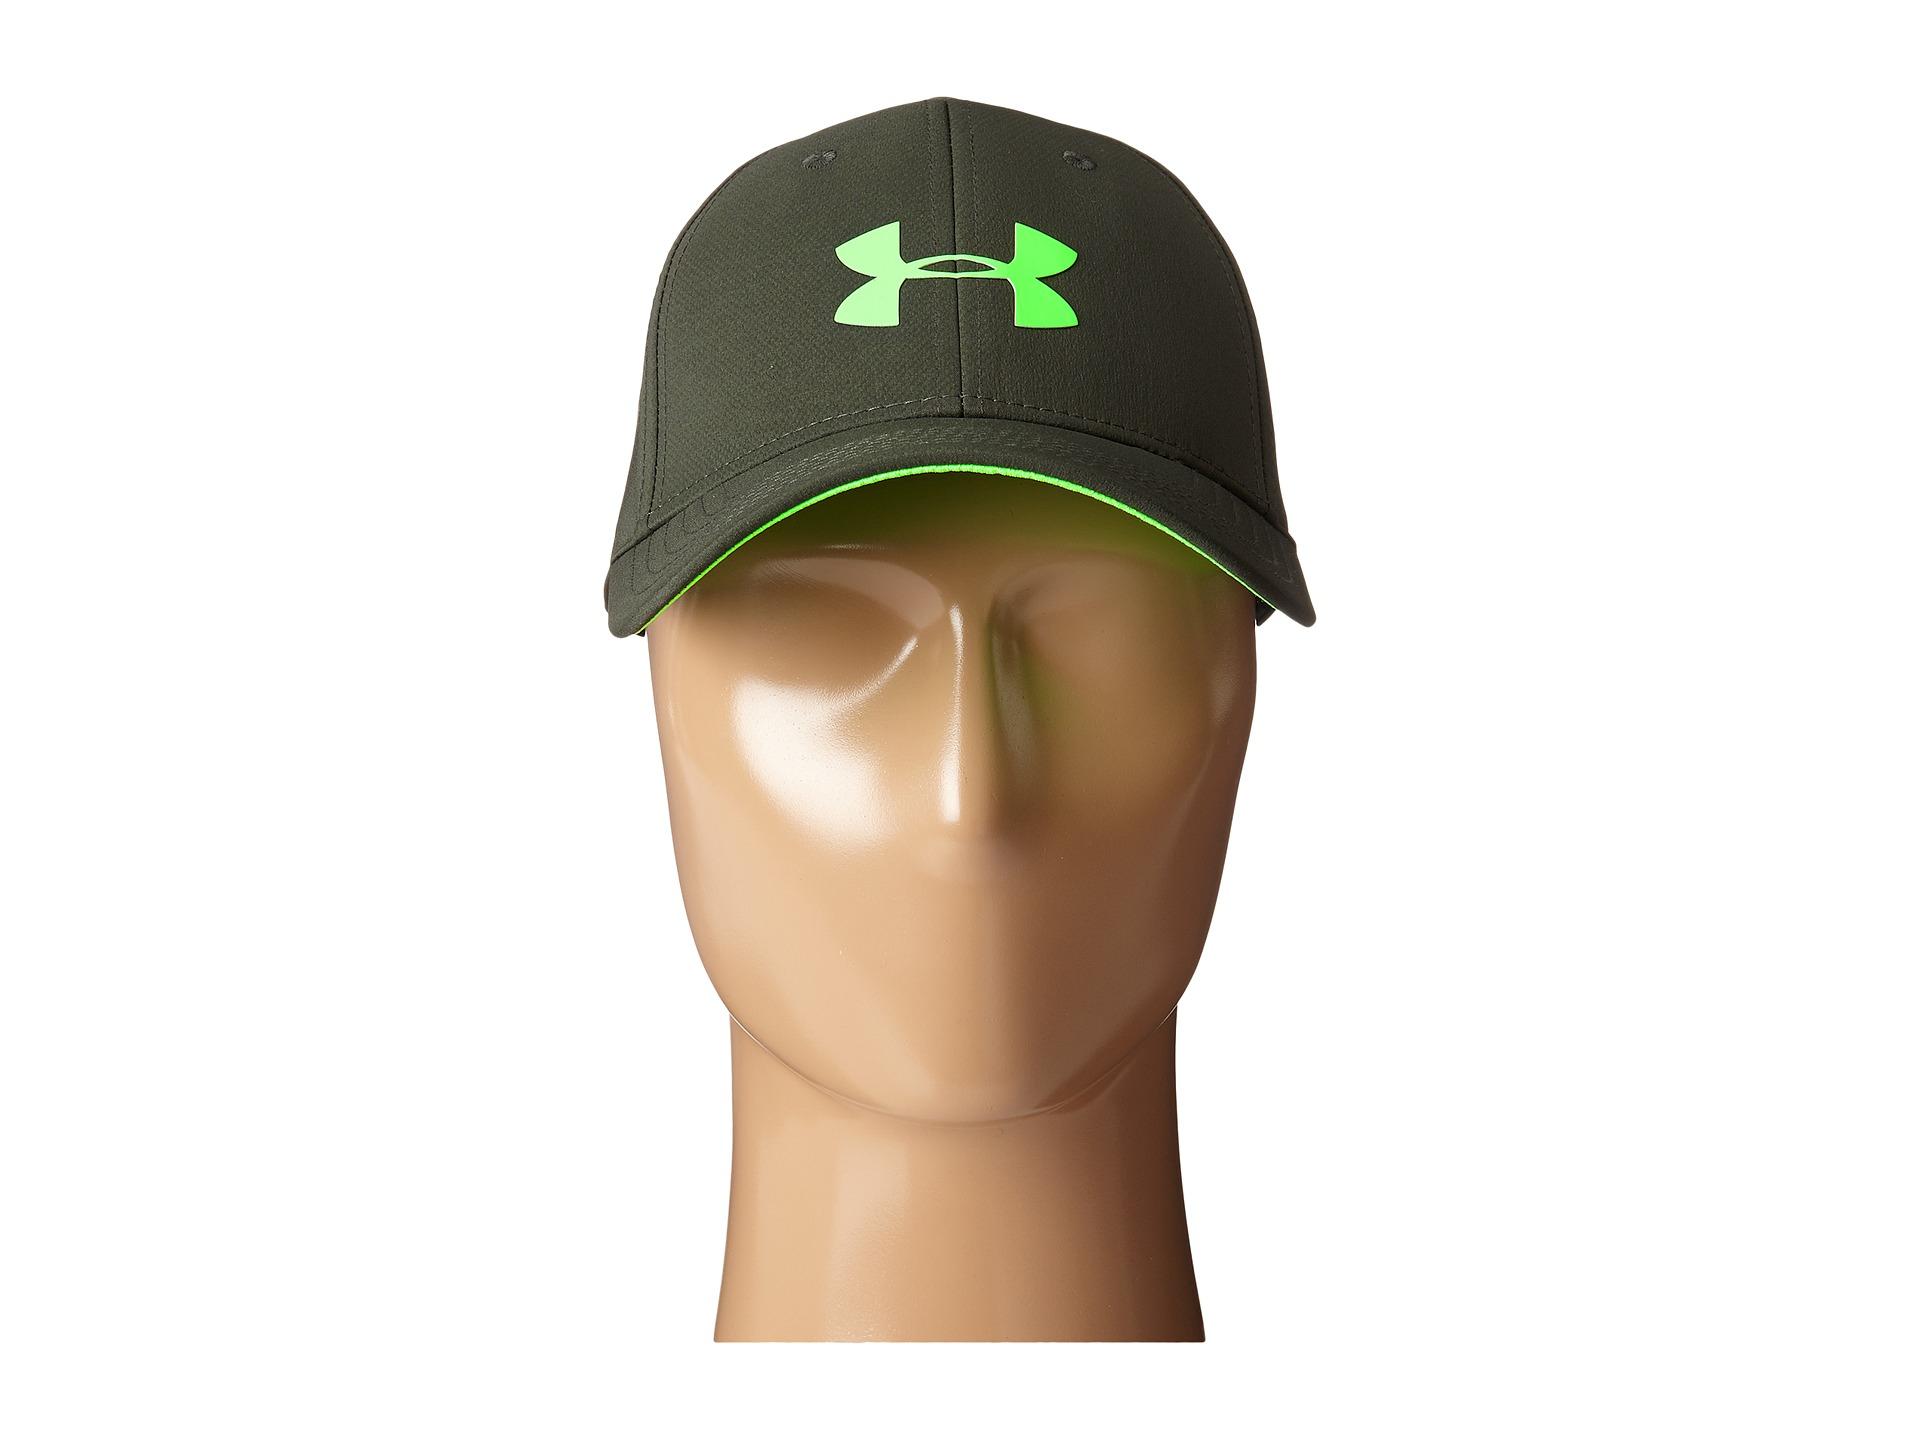 Lyst - Under Armour Ua Headline Stretch Fit Cap in Green for Men 964cb4e51fb